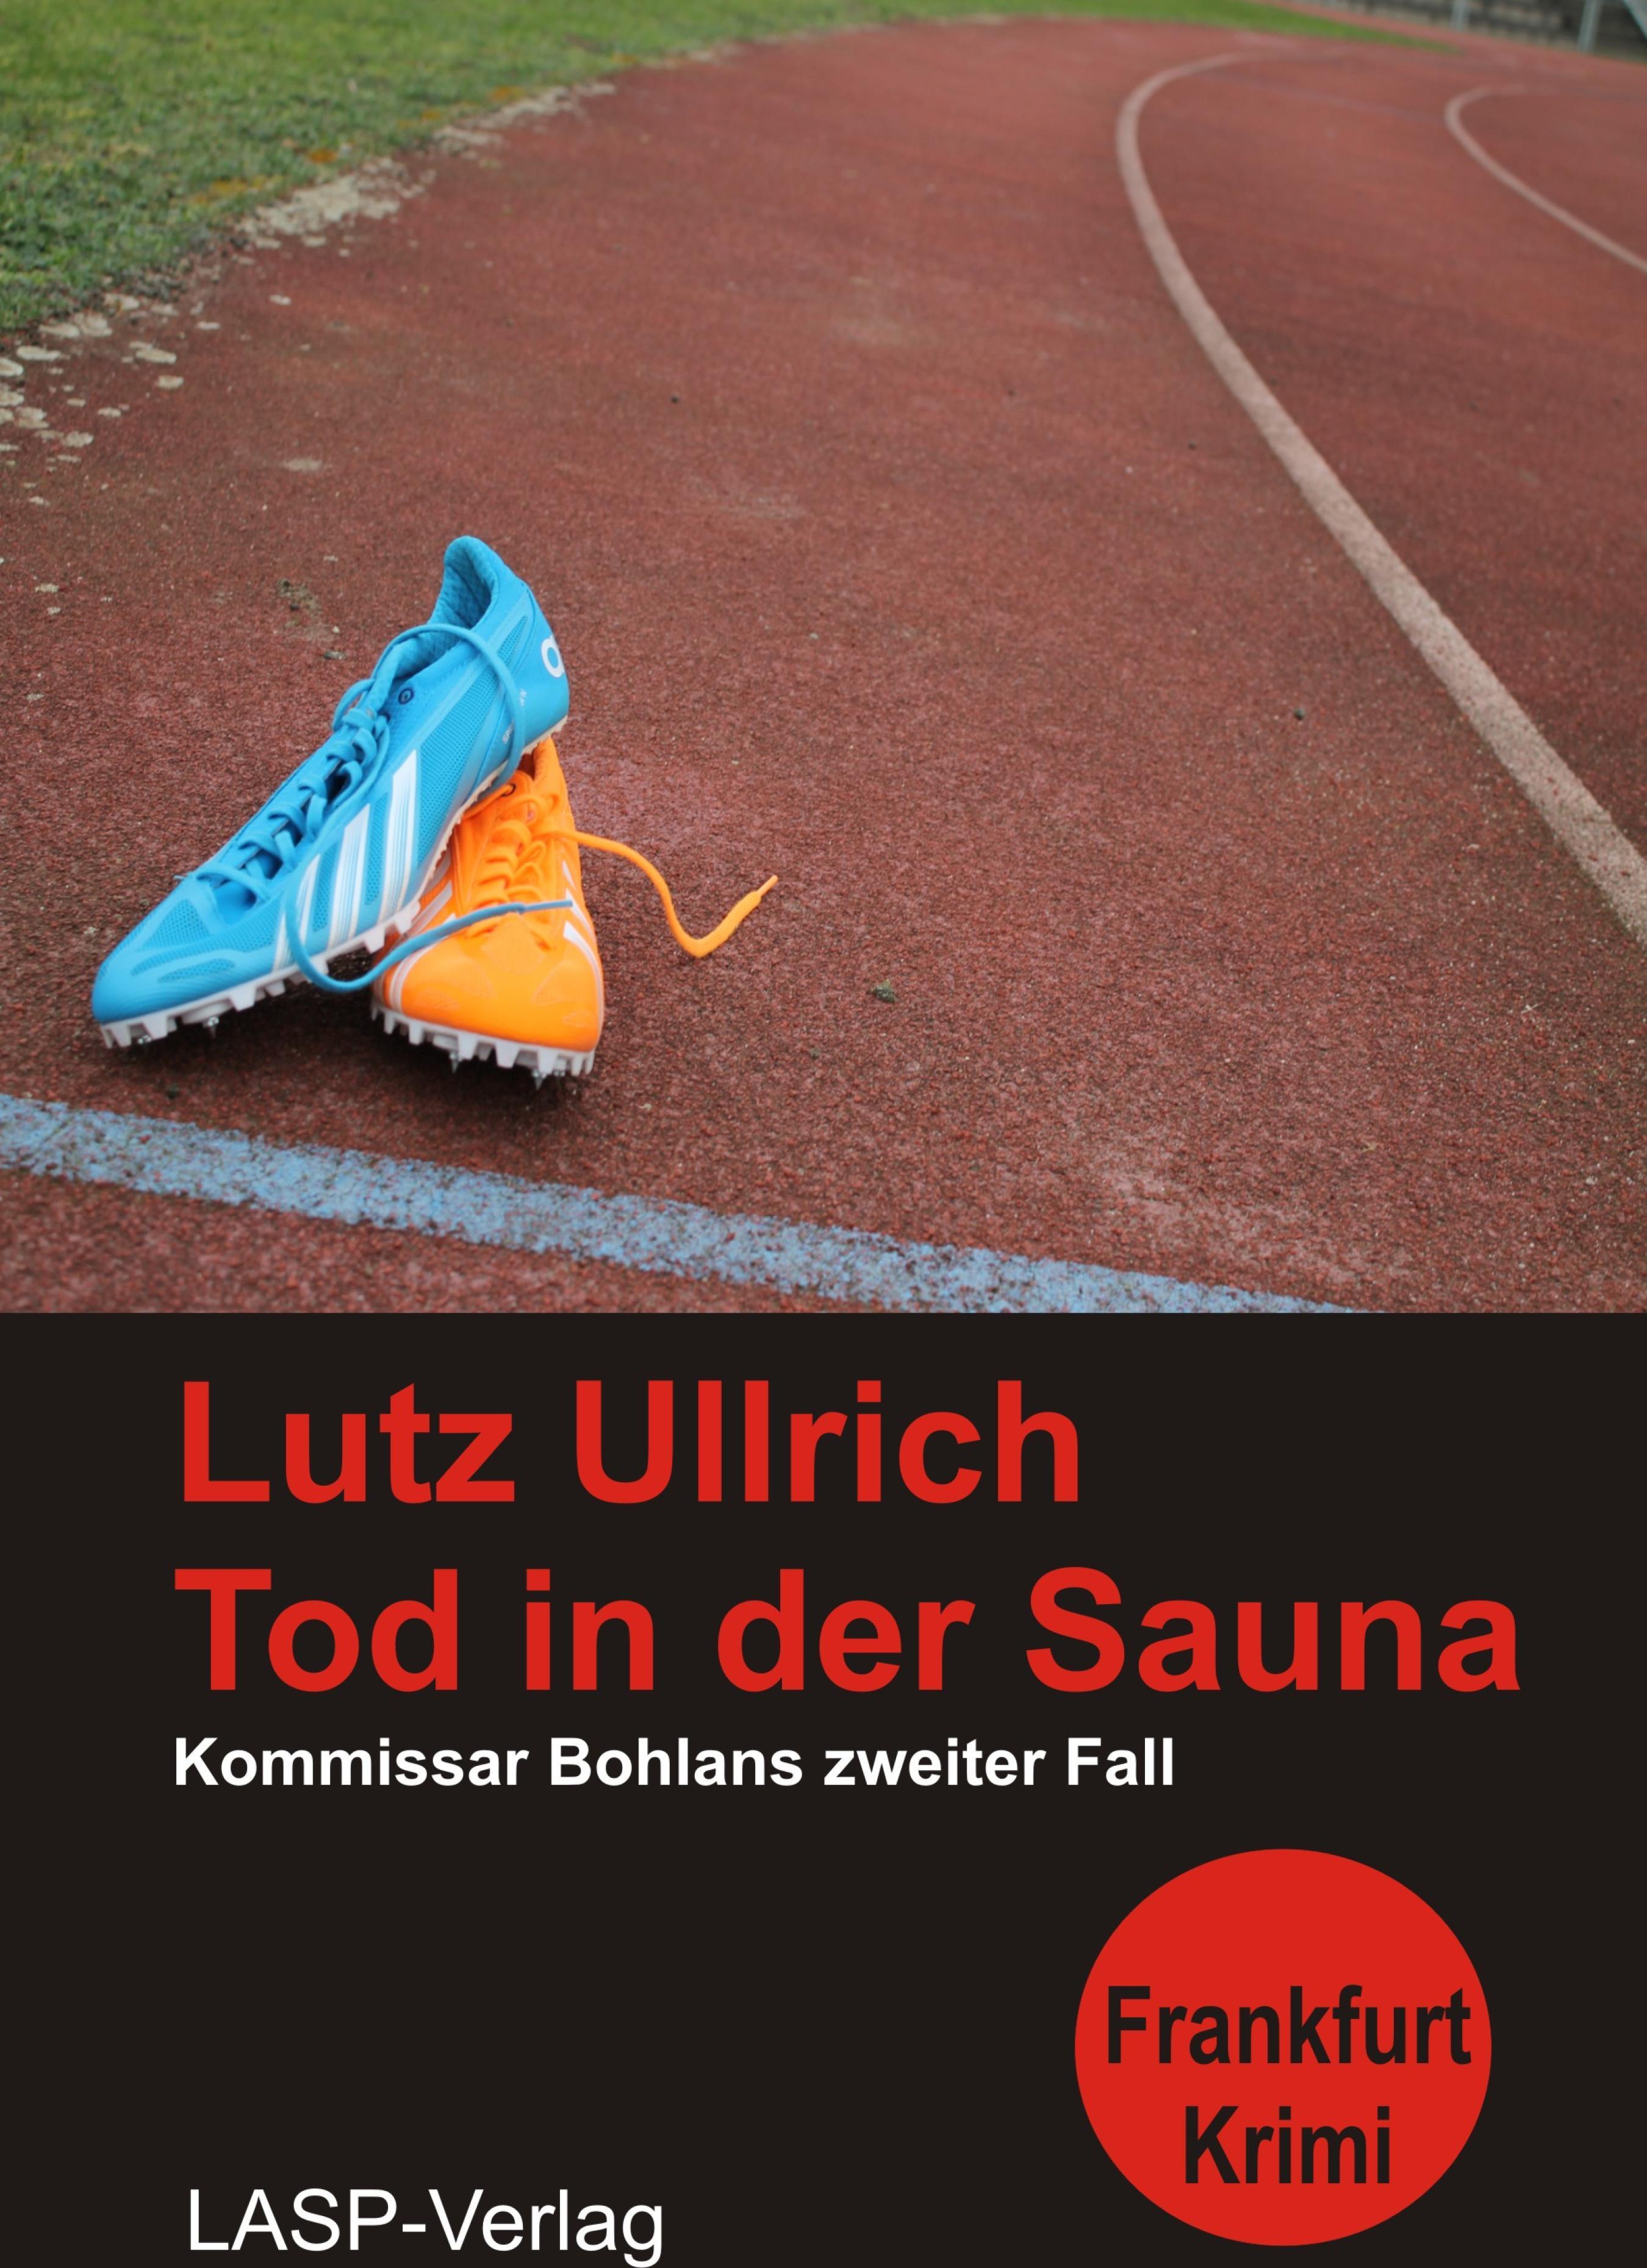 Lutz Ullrich Tod in der Sauna манн т смерть в венеции der tod in venedig